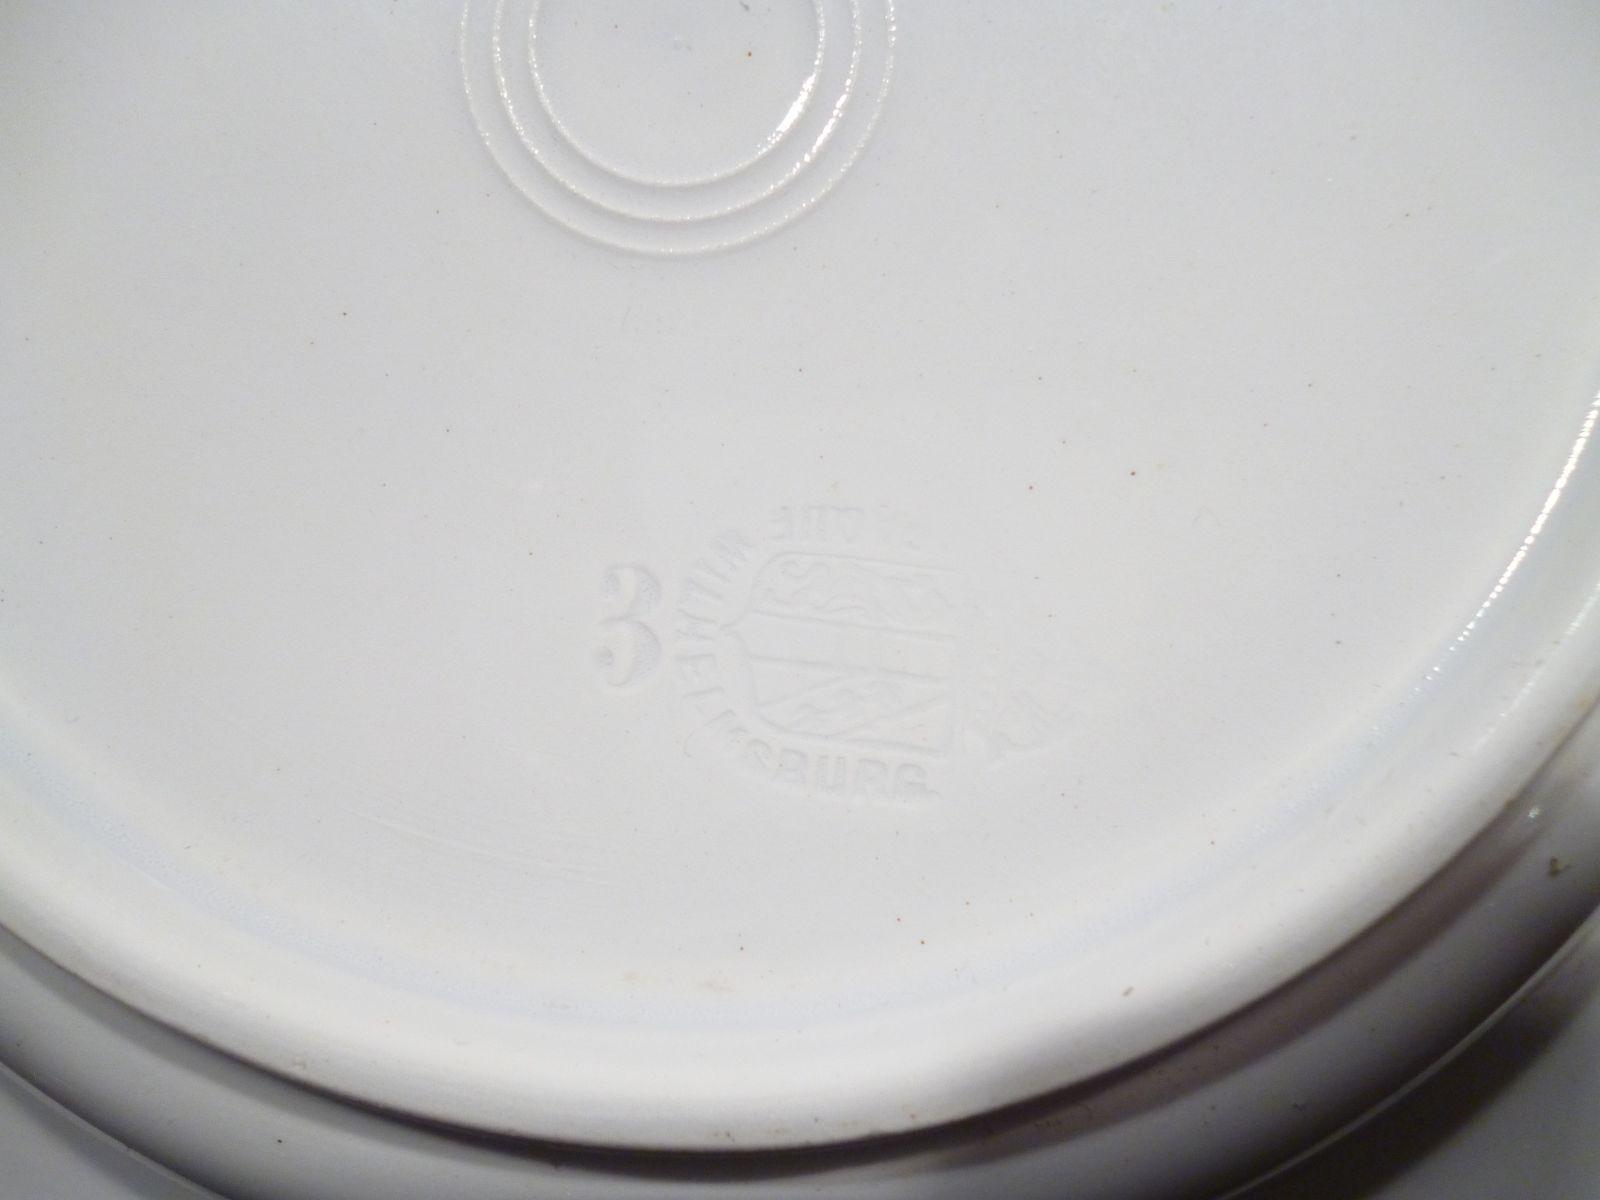 P1310143.JPG (1600�1200)